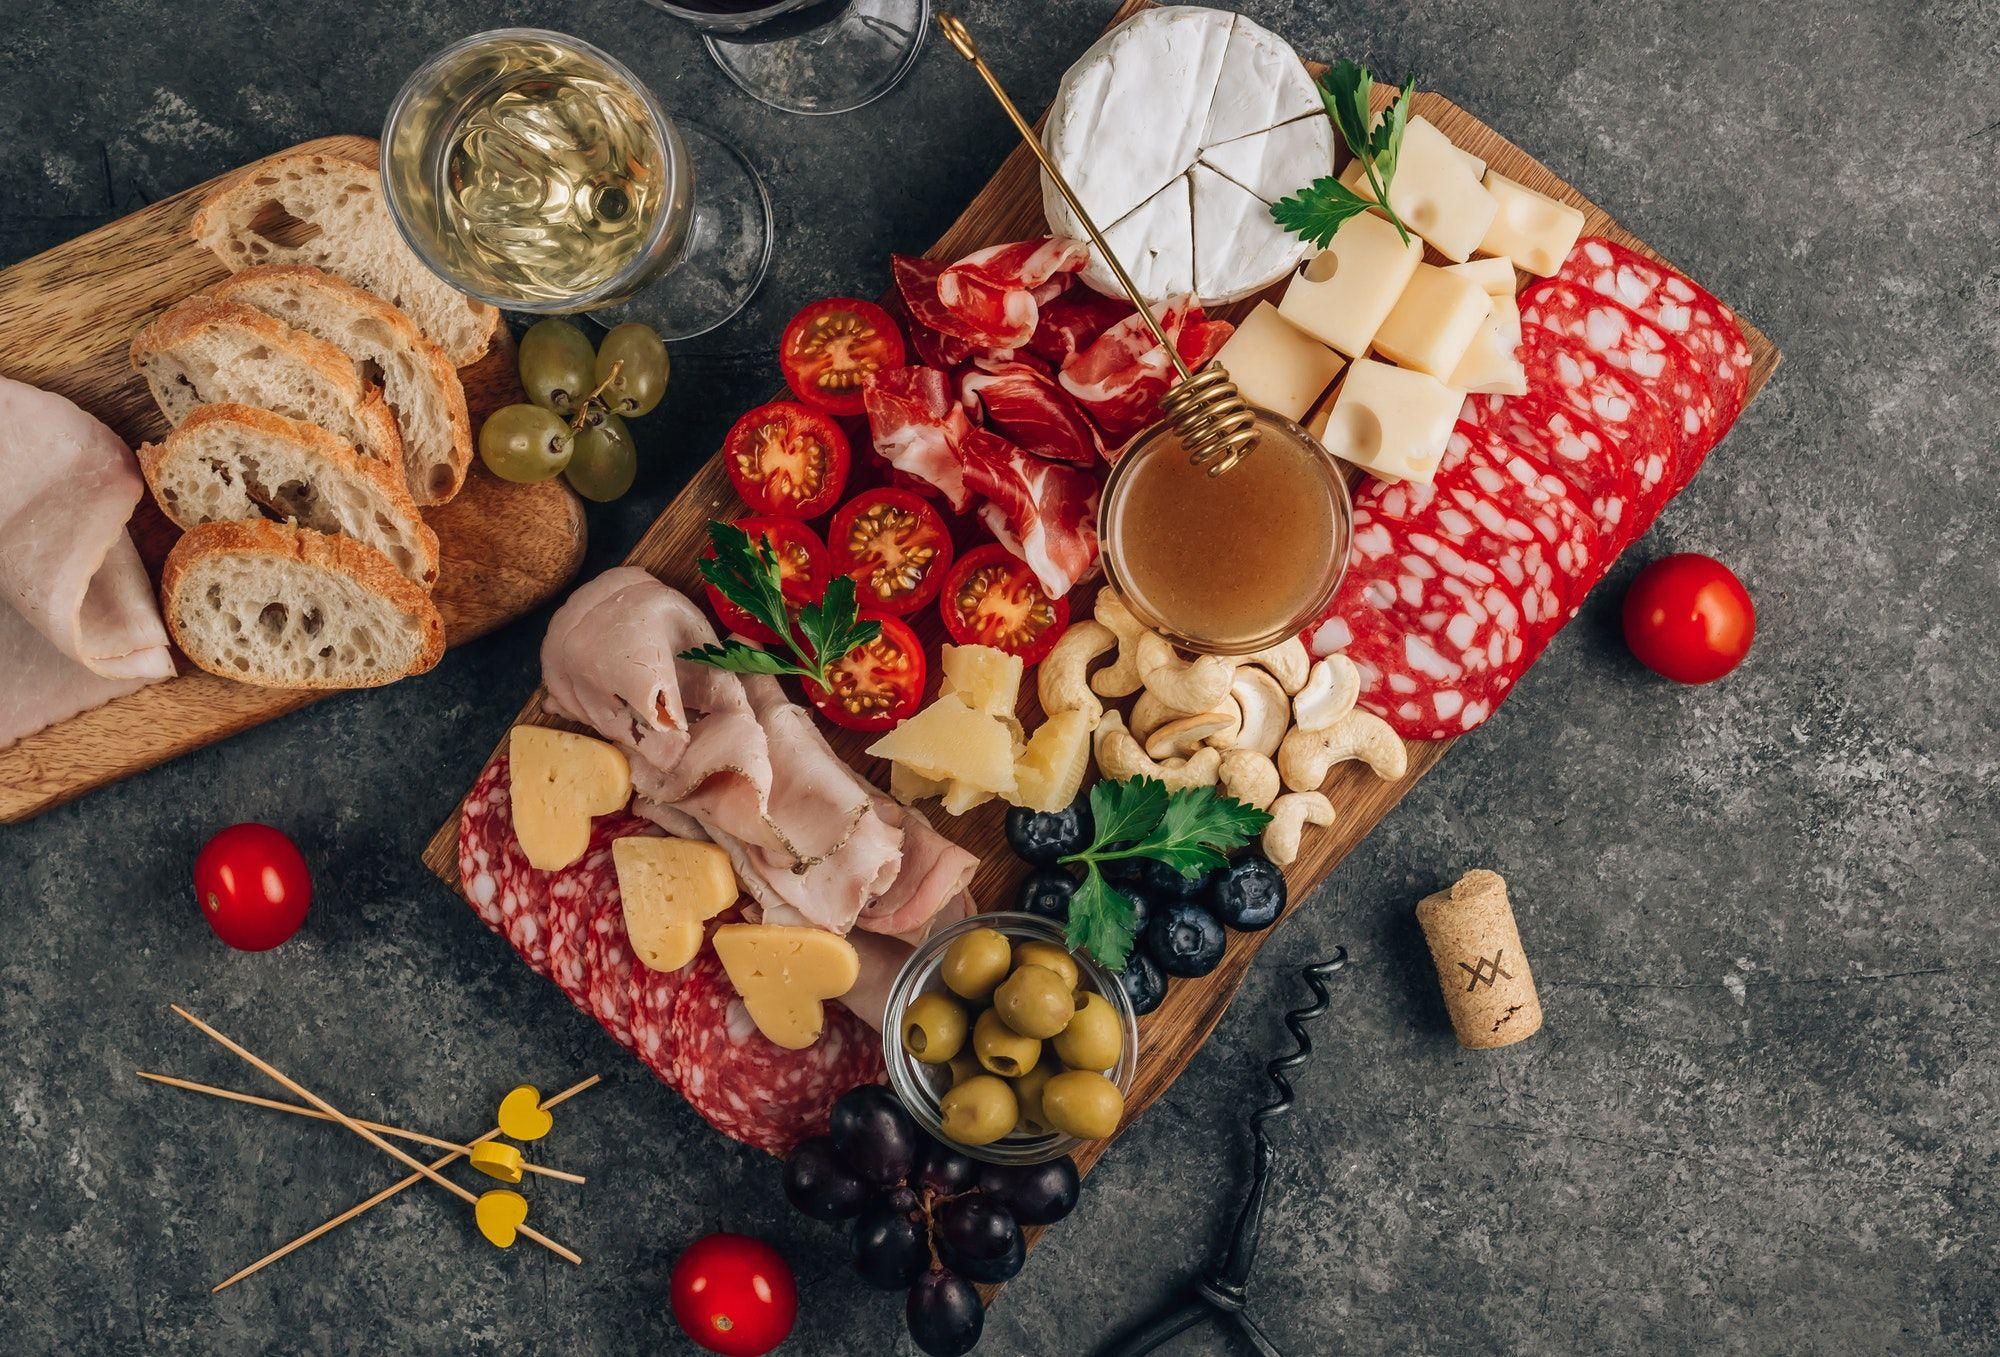 Assortment of spanish tapas or italian antipasti